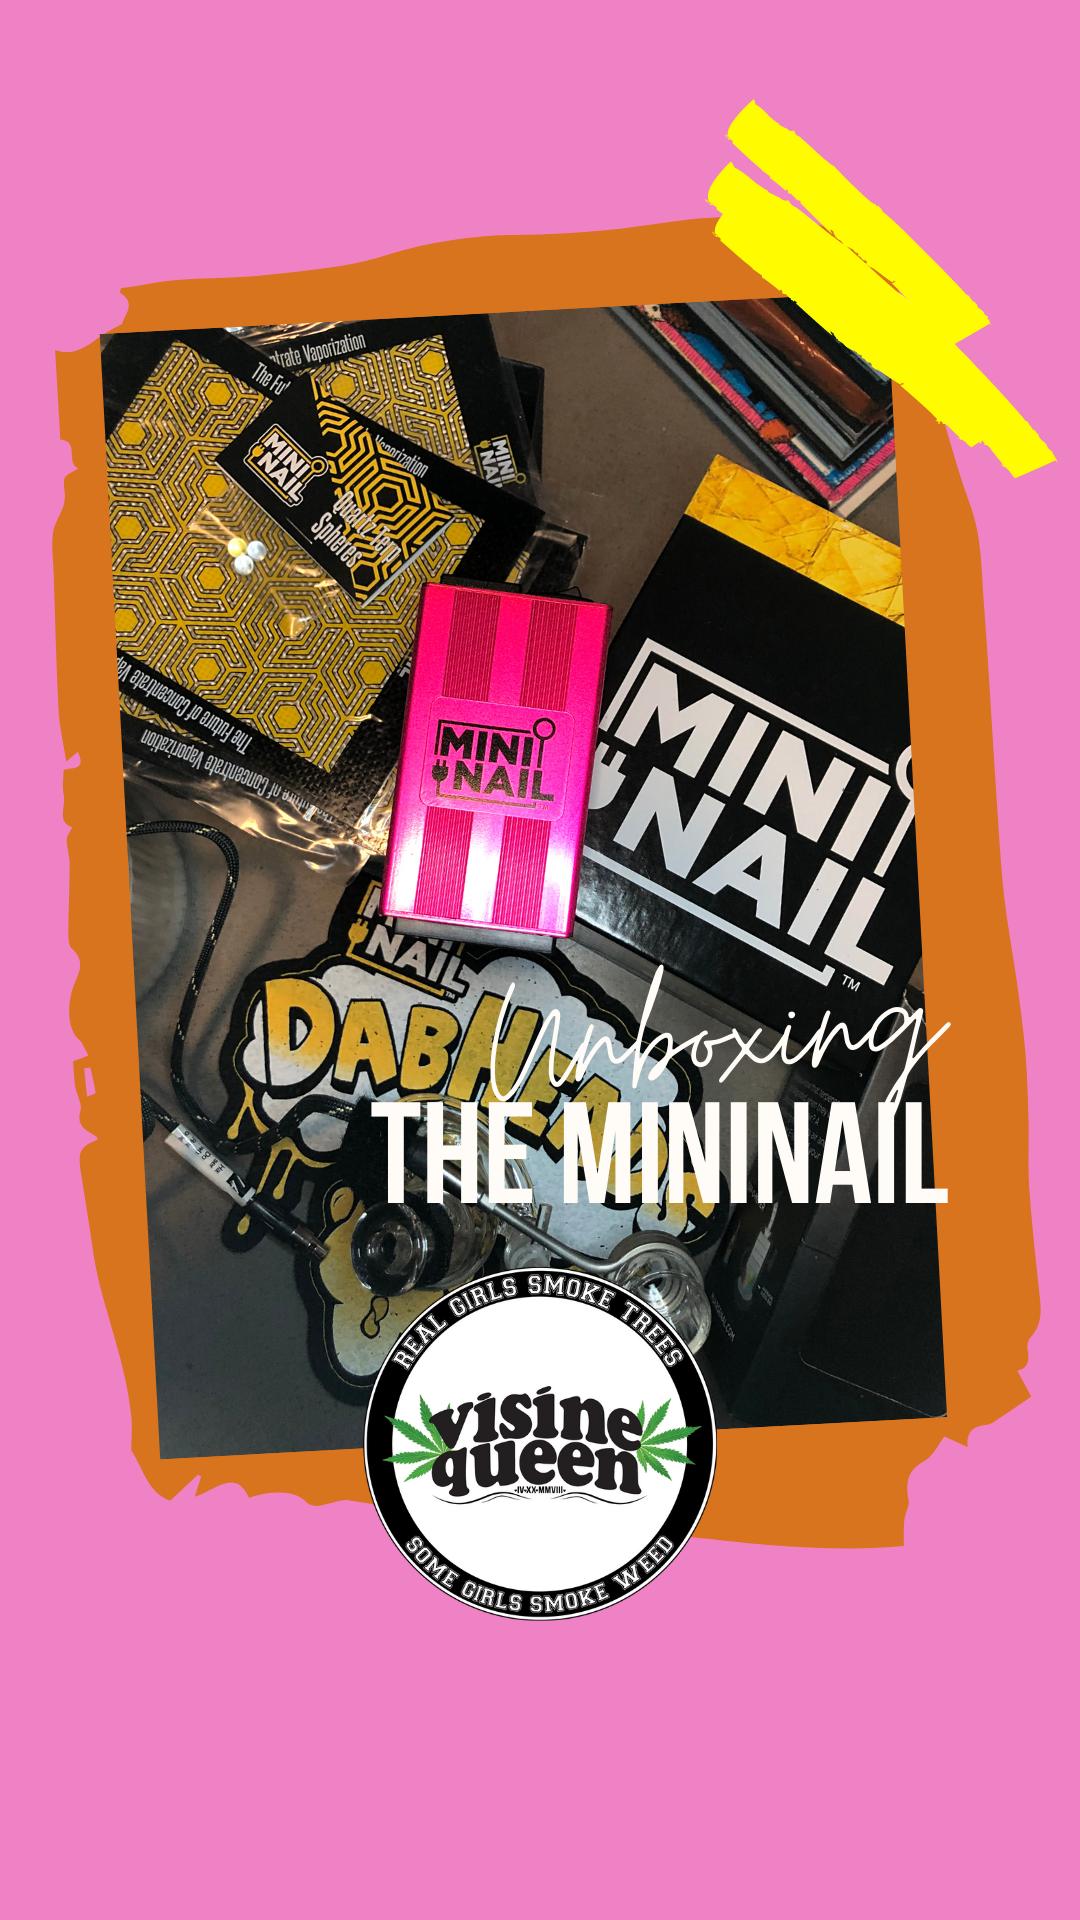 Unboxing TheMiniNail: Nail for Dabbing